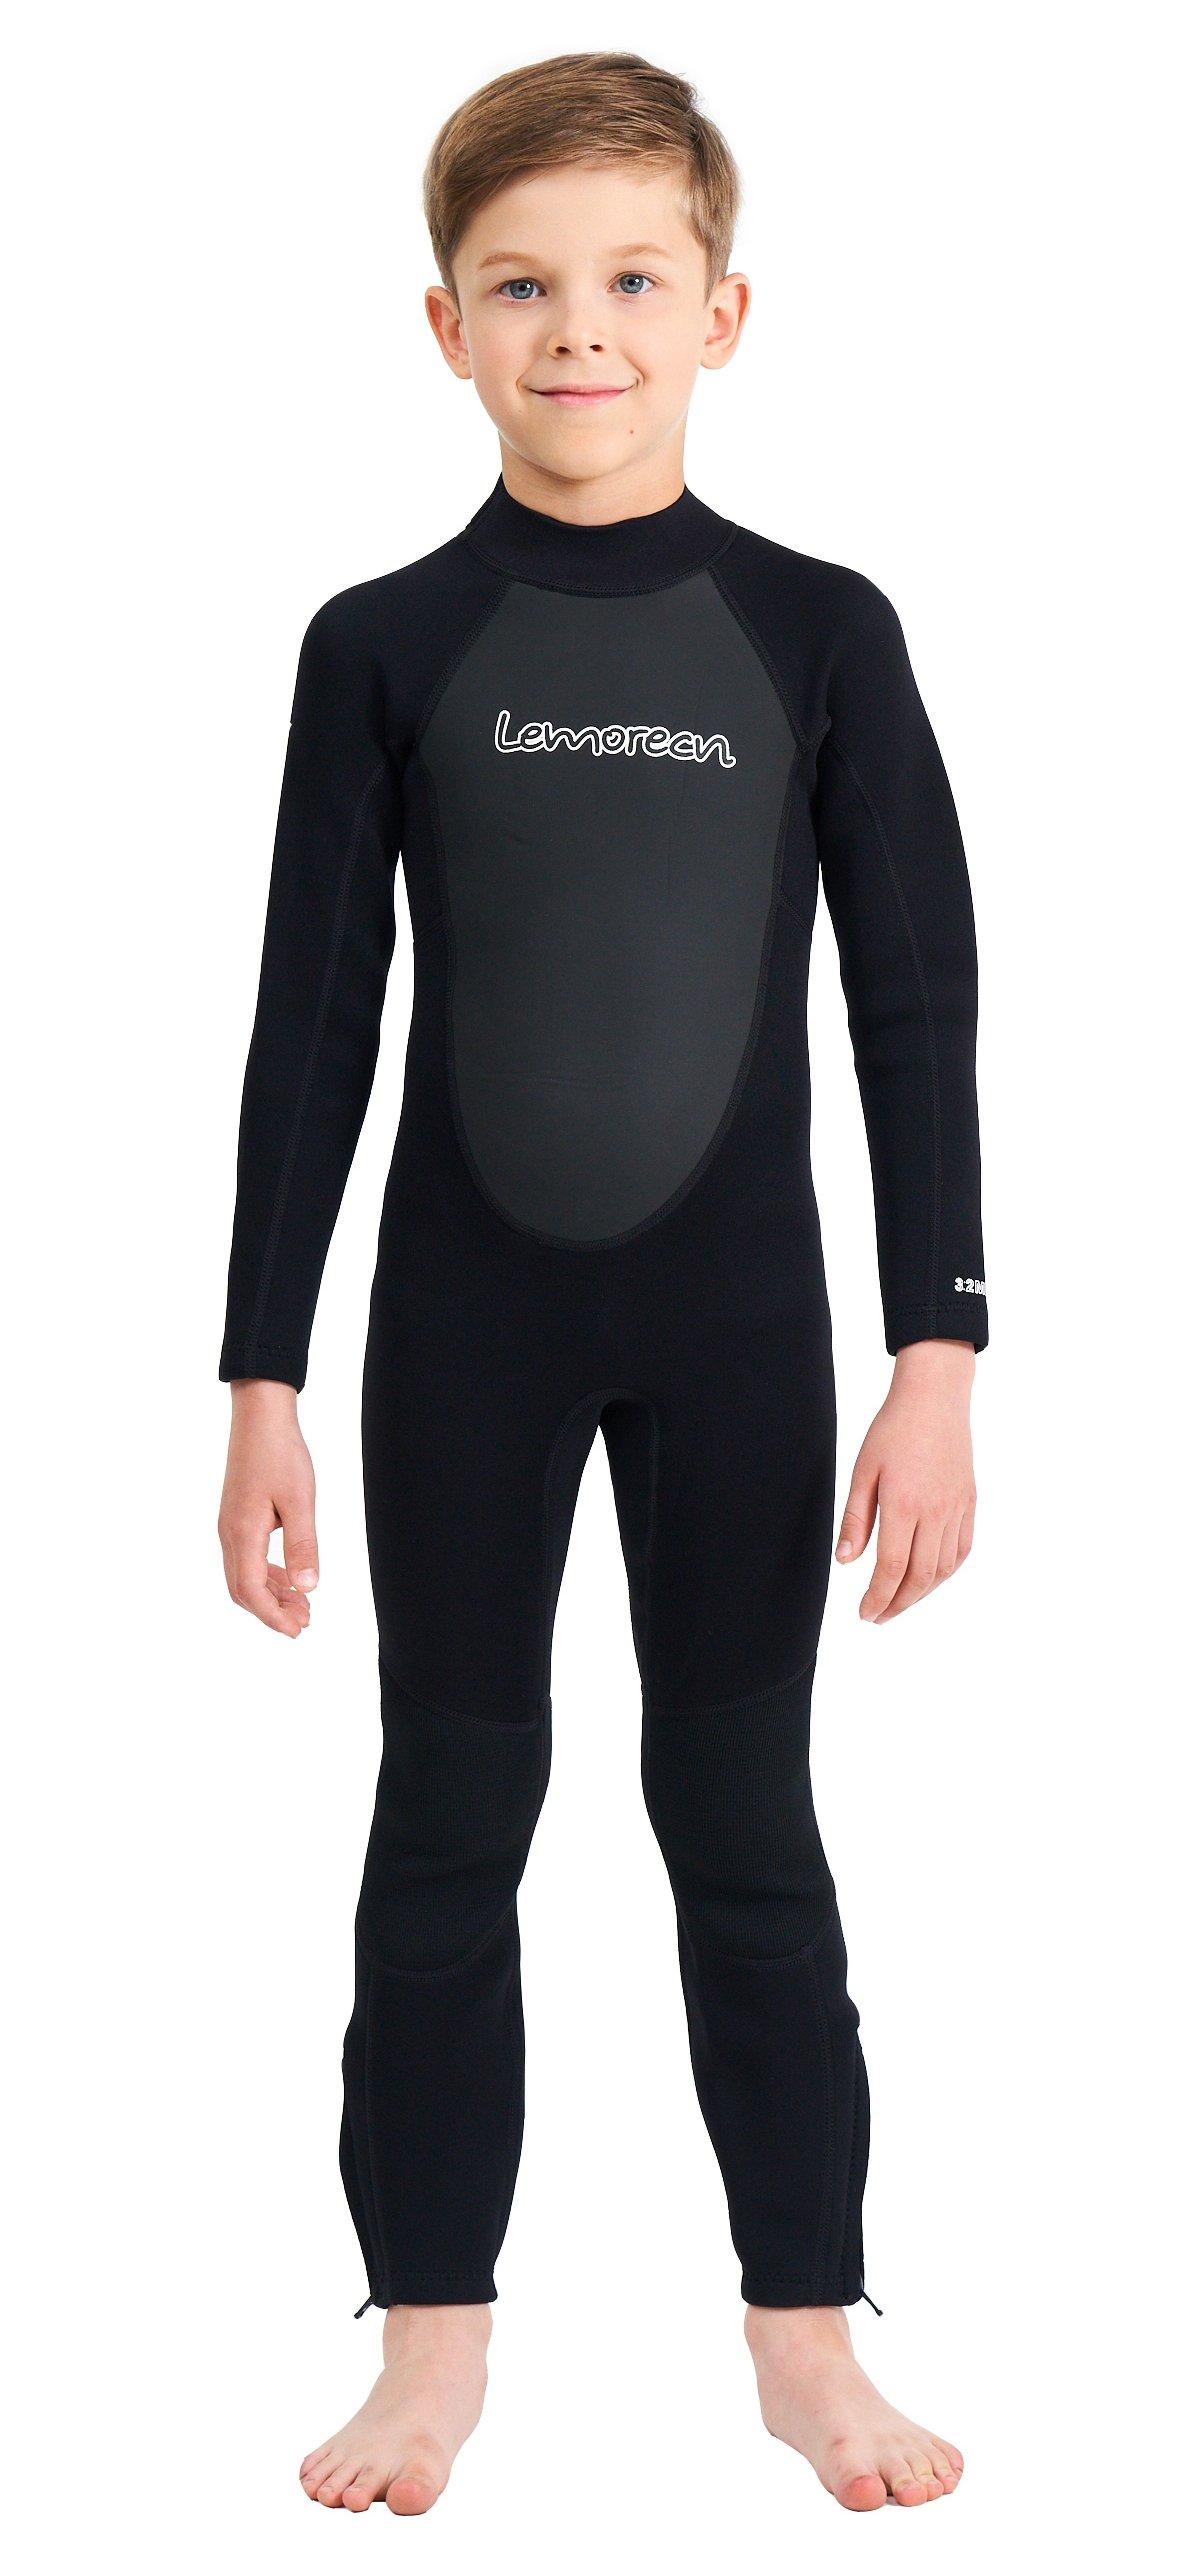 Lemorecn Wetsuits Youth 3/2 mm Full Diving Suit(4031black12)